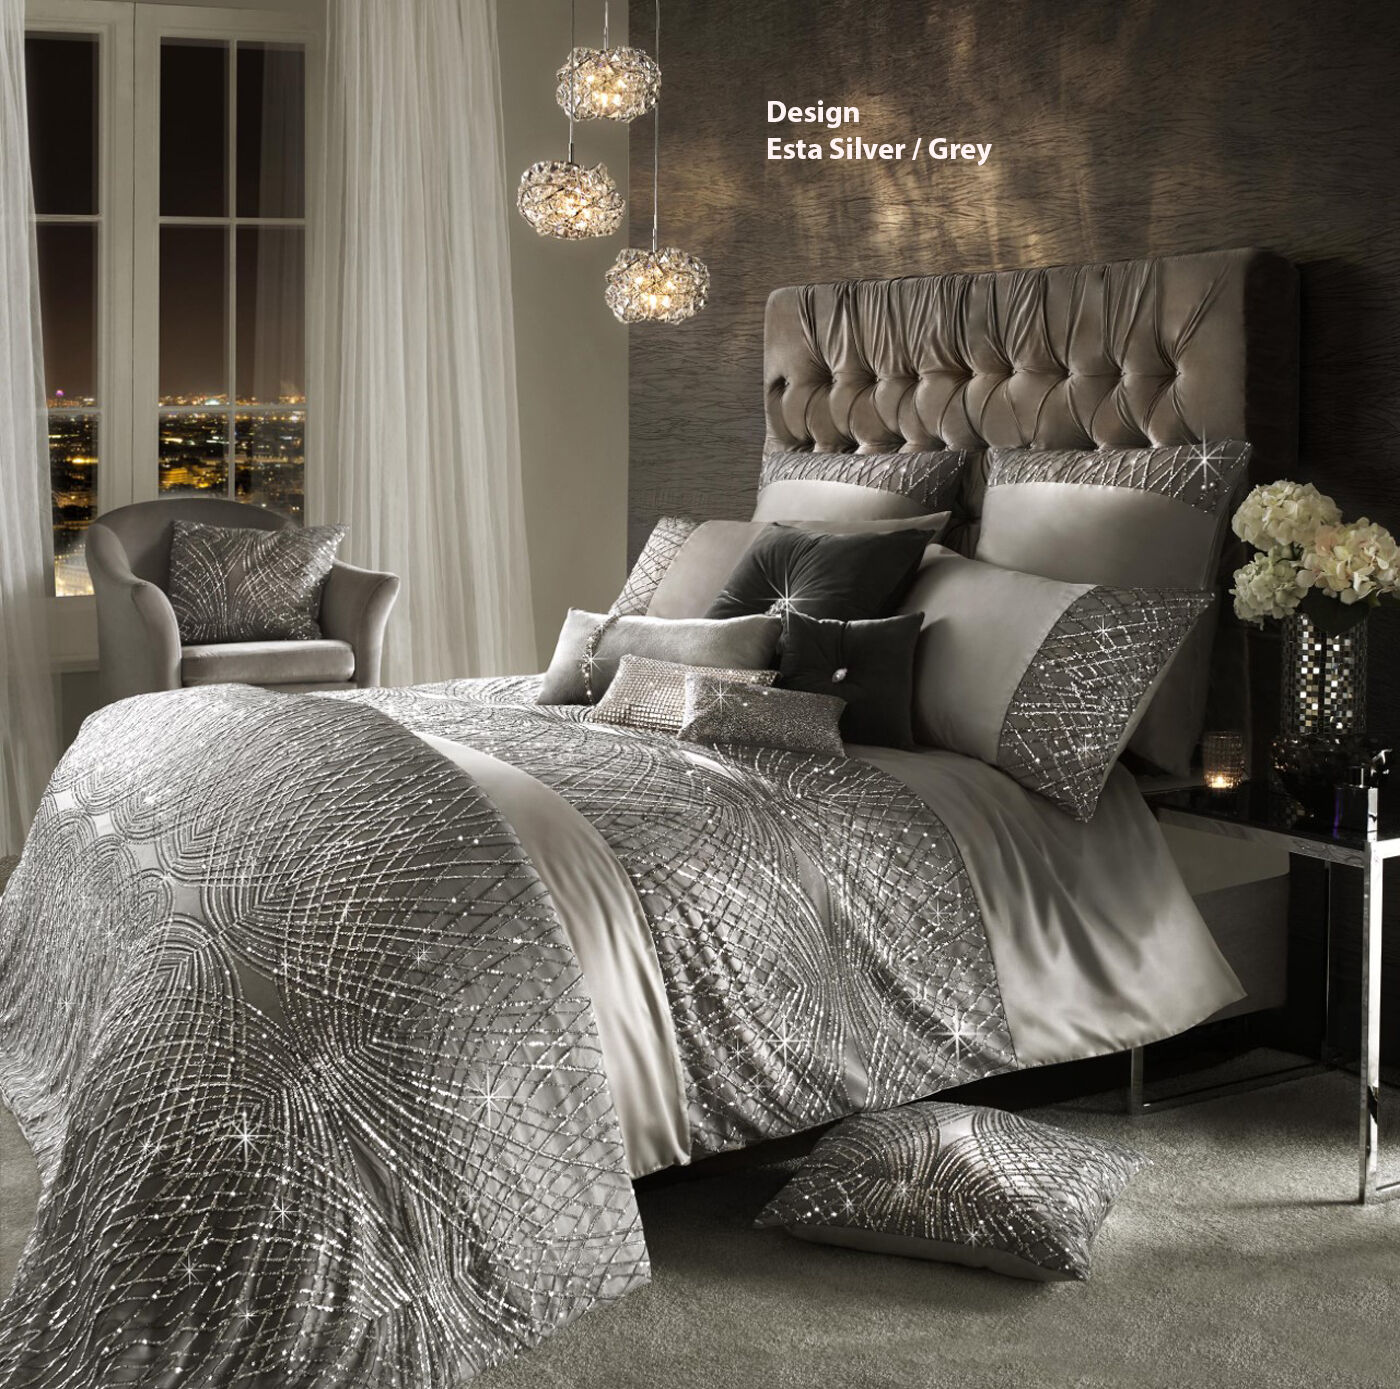 layer bed desktop comp bedding featured plp comforter biltmore designer contessa a bath product src luxury shops set dwp belk